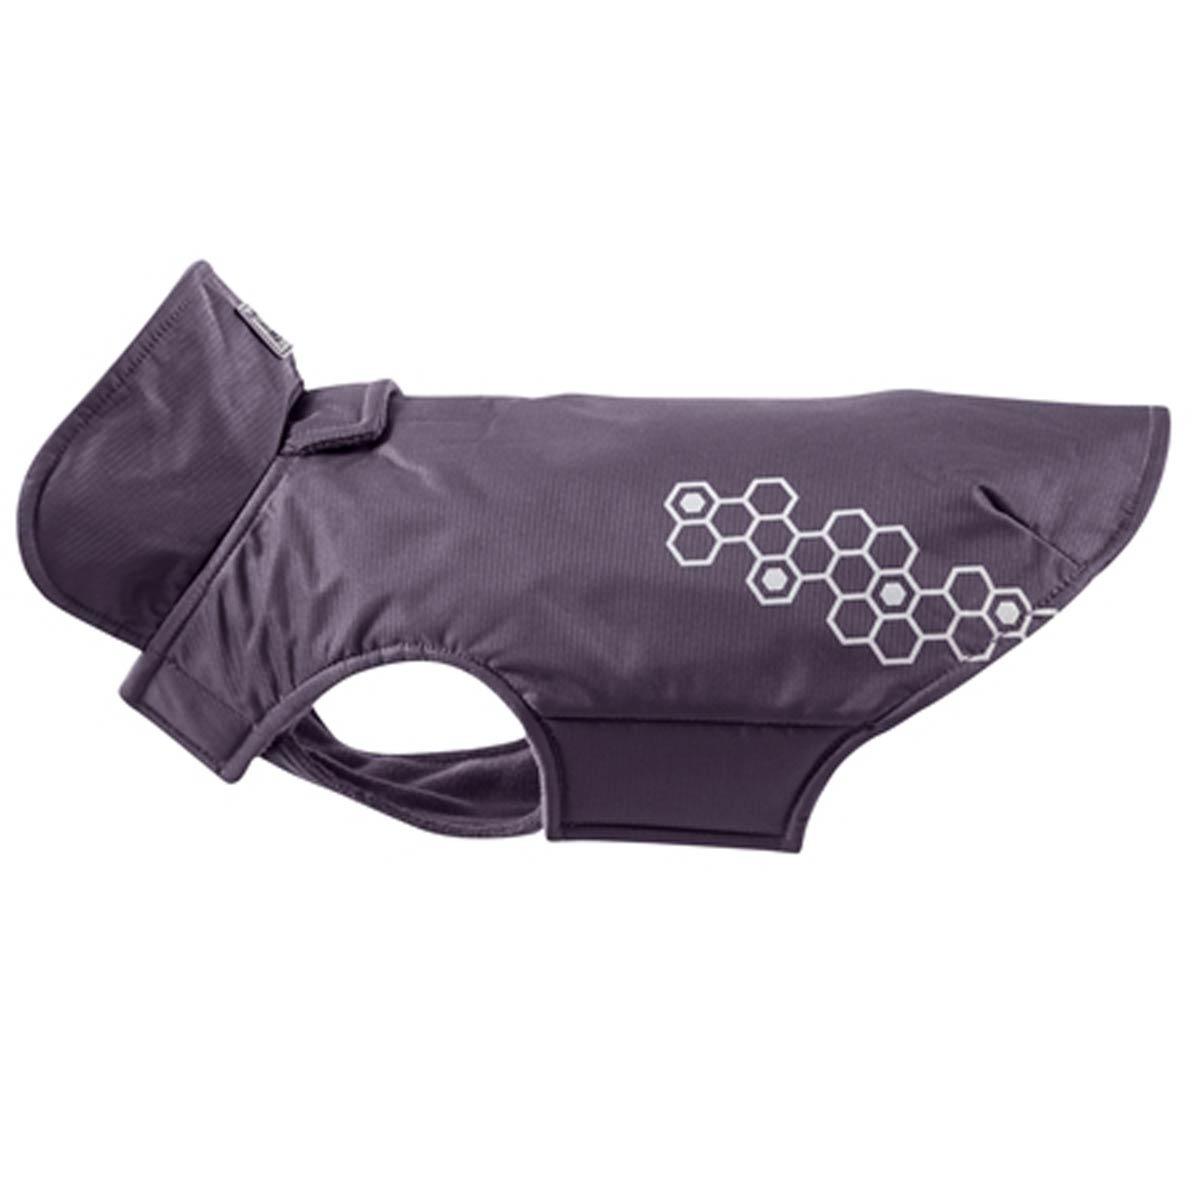 Venture Outerwear Dog Coat - Slate